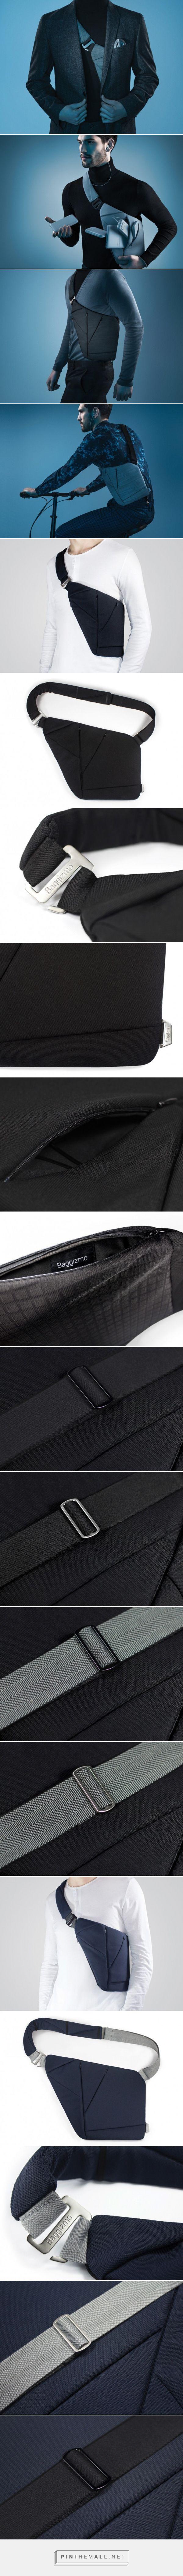 Baggizmo Textile Bag | Designboom Shop - created via https://pinthemall.net